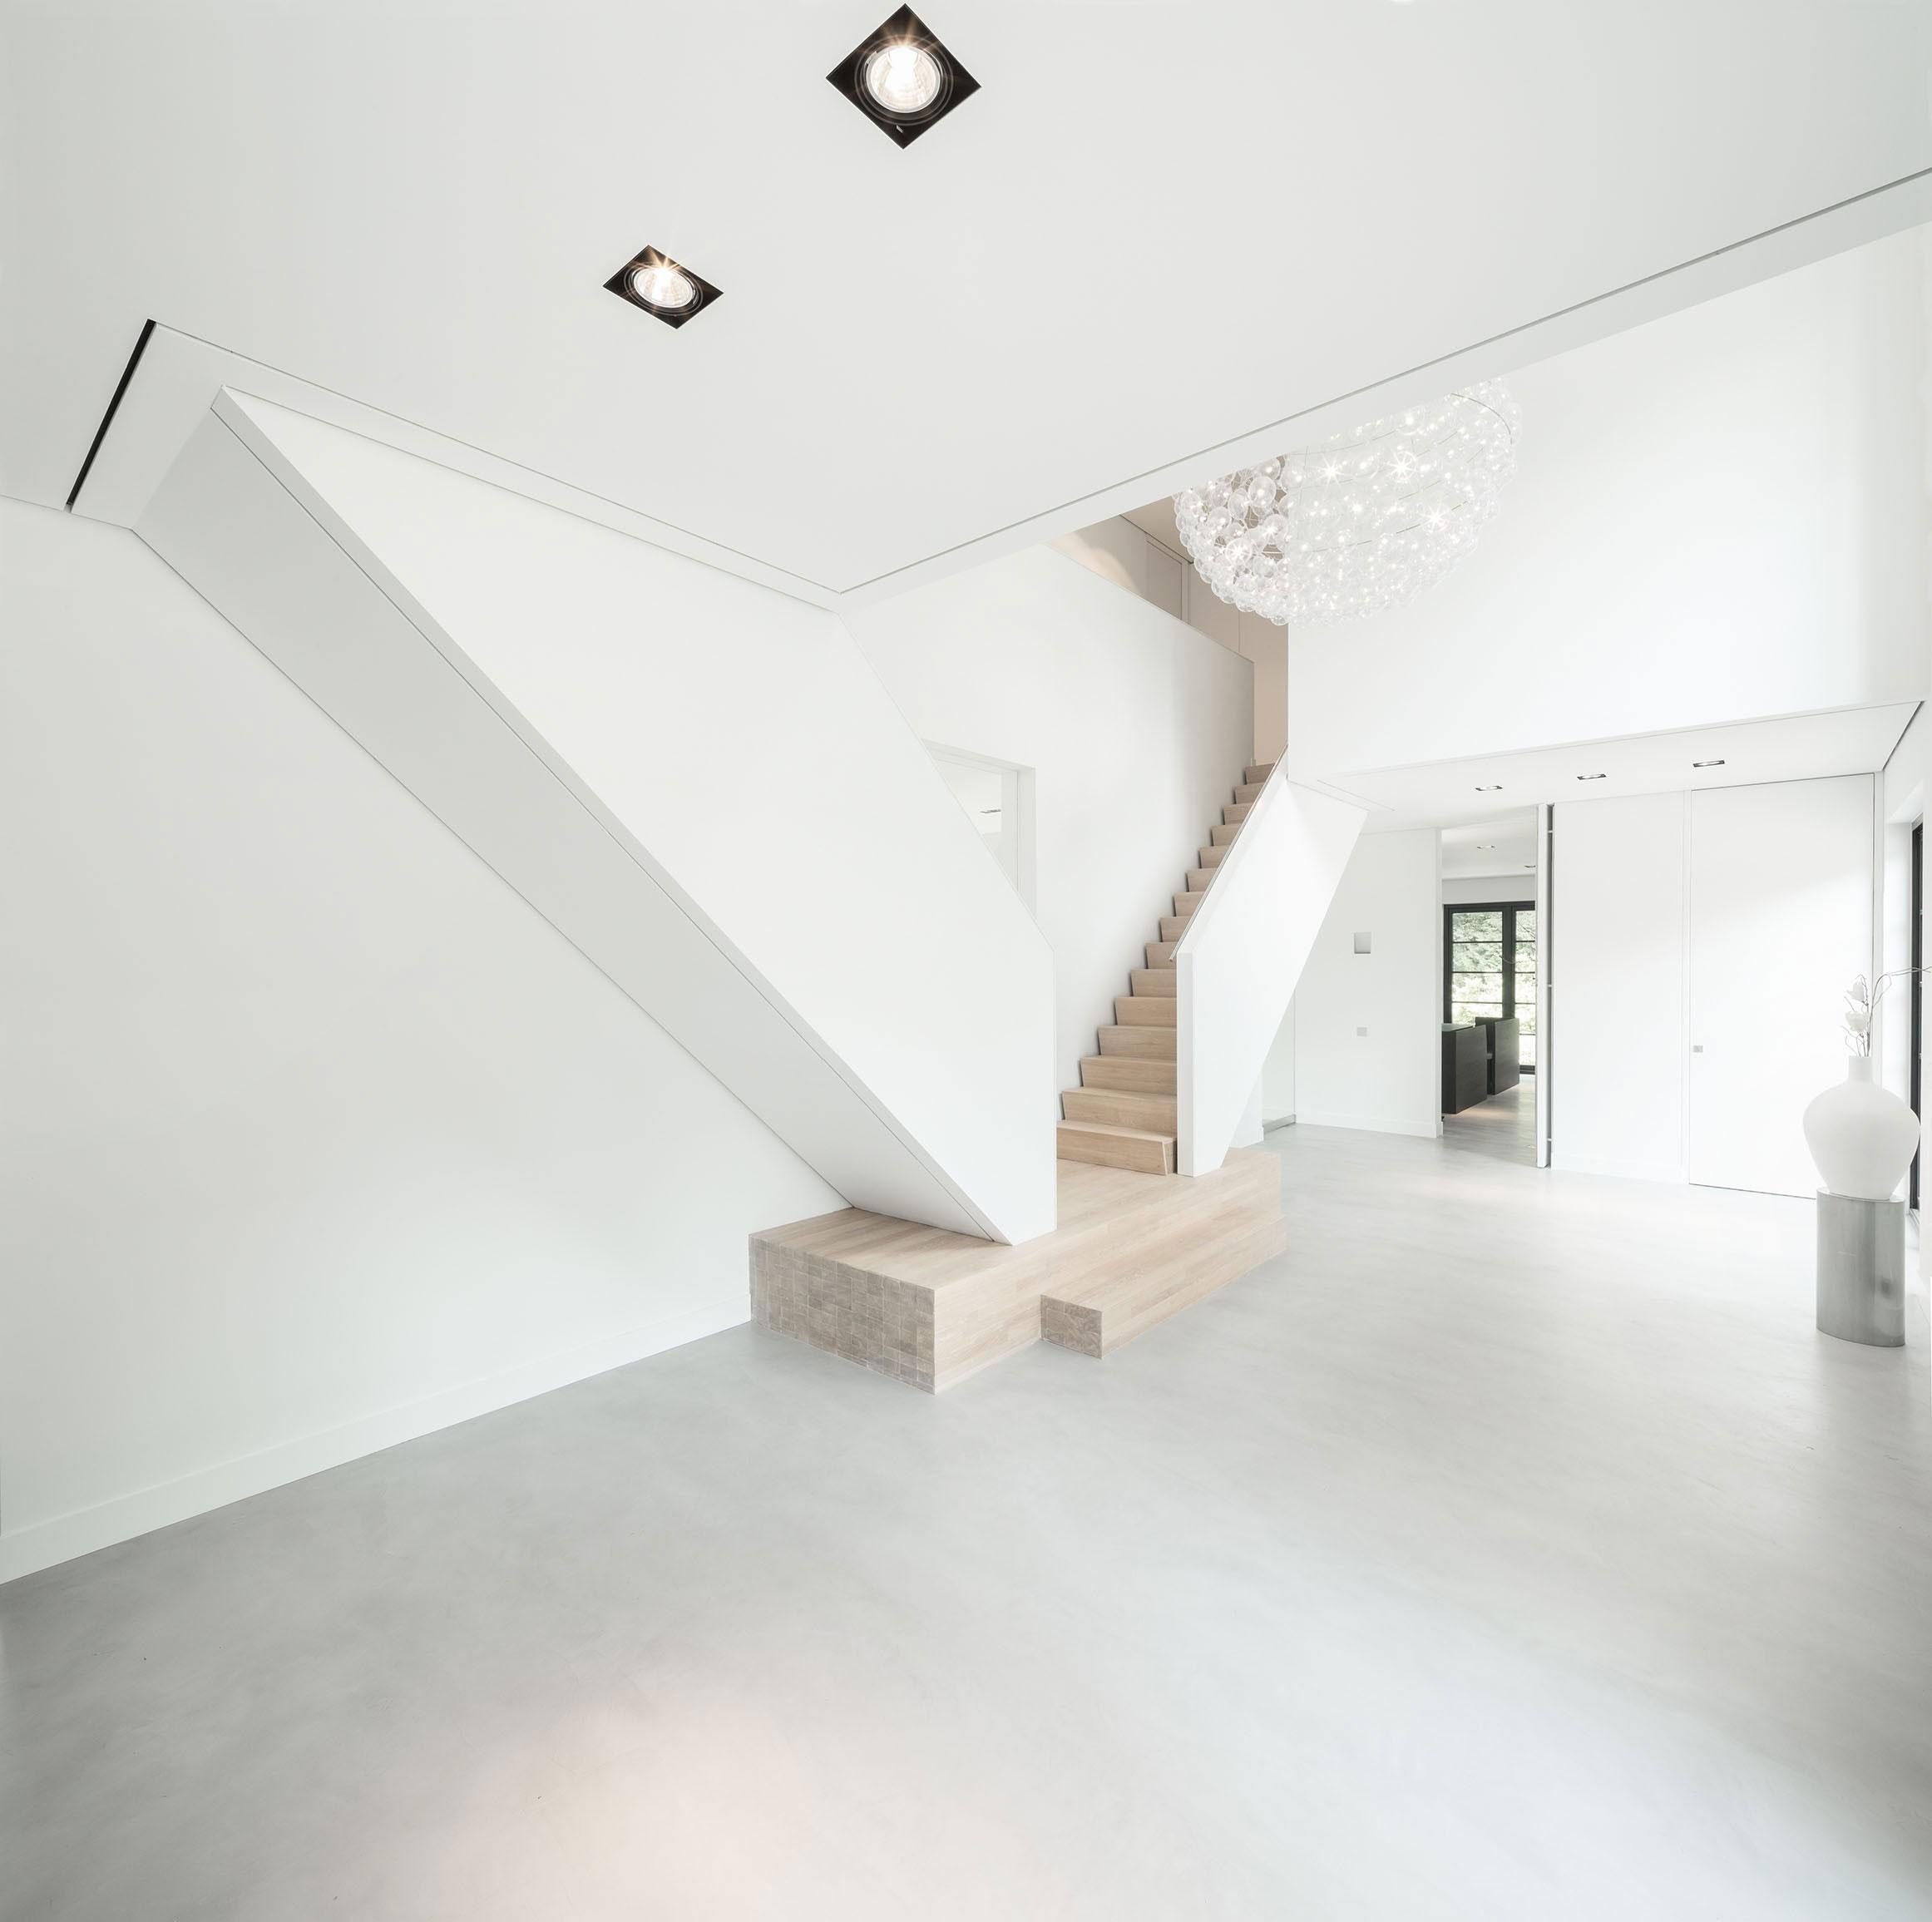 Modern Huizen Country House Located in a Quiet Rural Setting by De Brouwer Binnenwerk-13